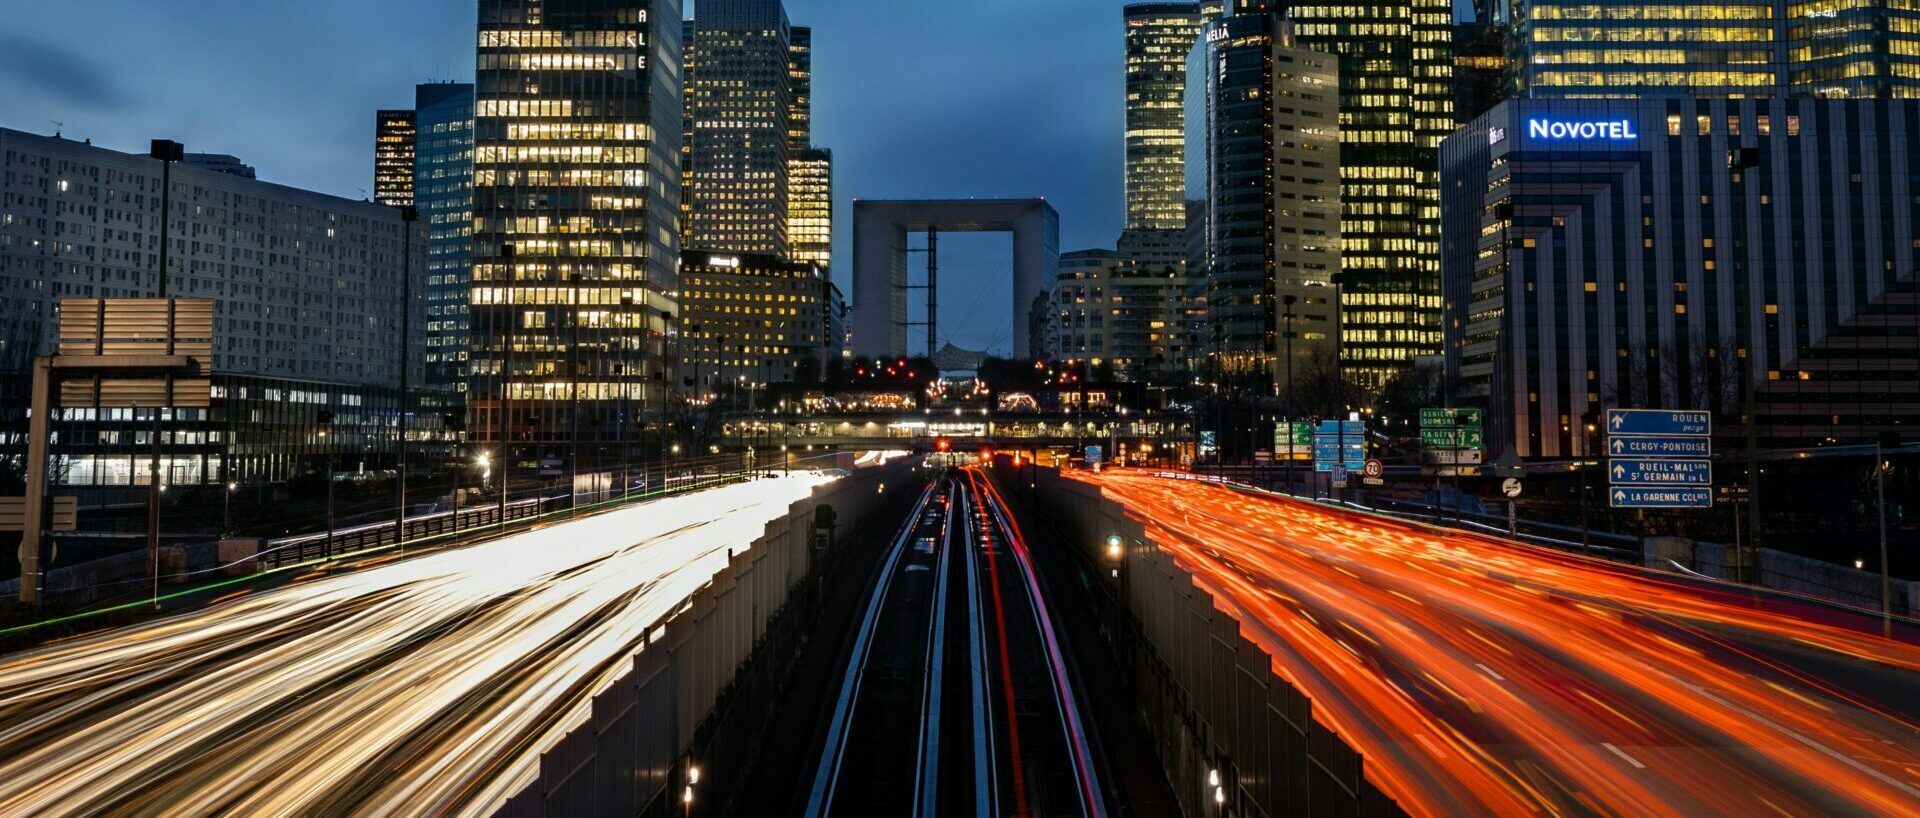 Change Finance -  - European Banking Authority Paris